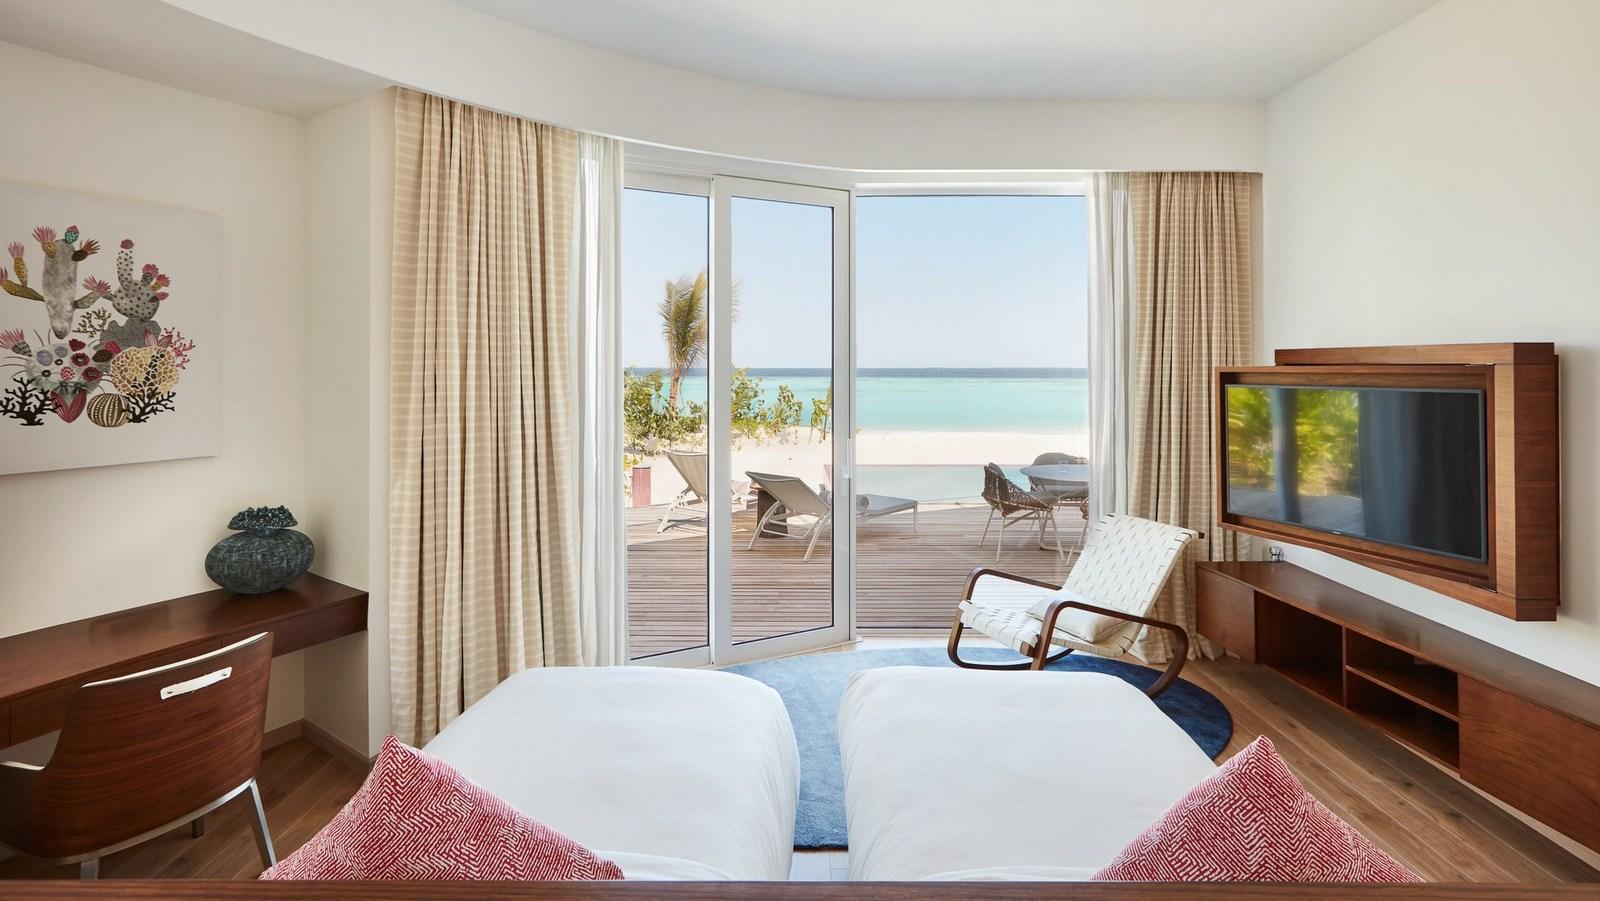 Мальдивы, отель LUX North Male Atoll, номер Beach Residence 2 Bedroom with Pool